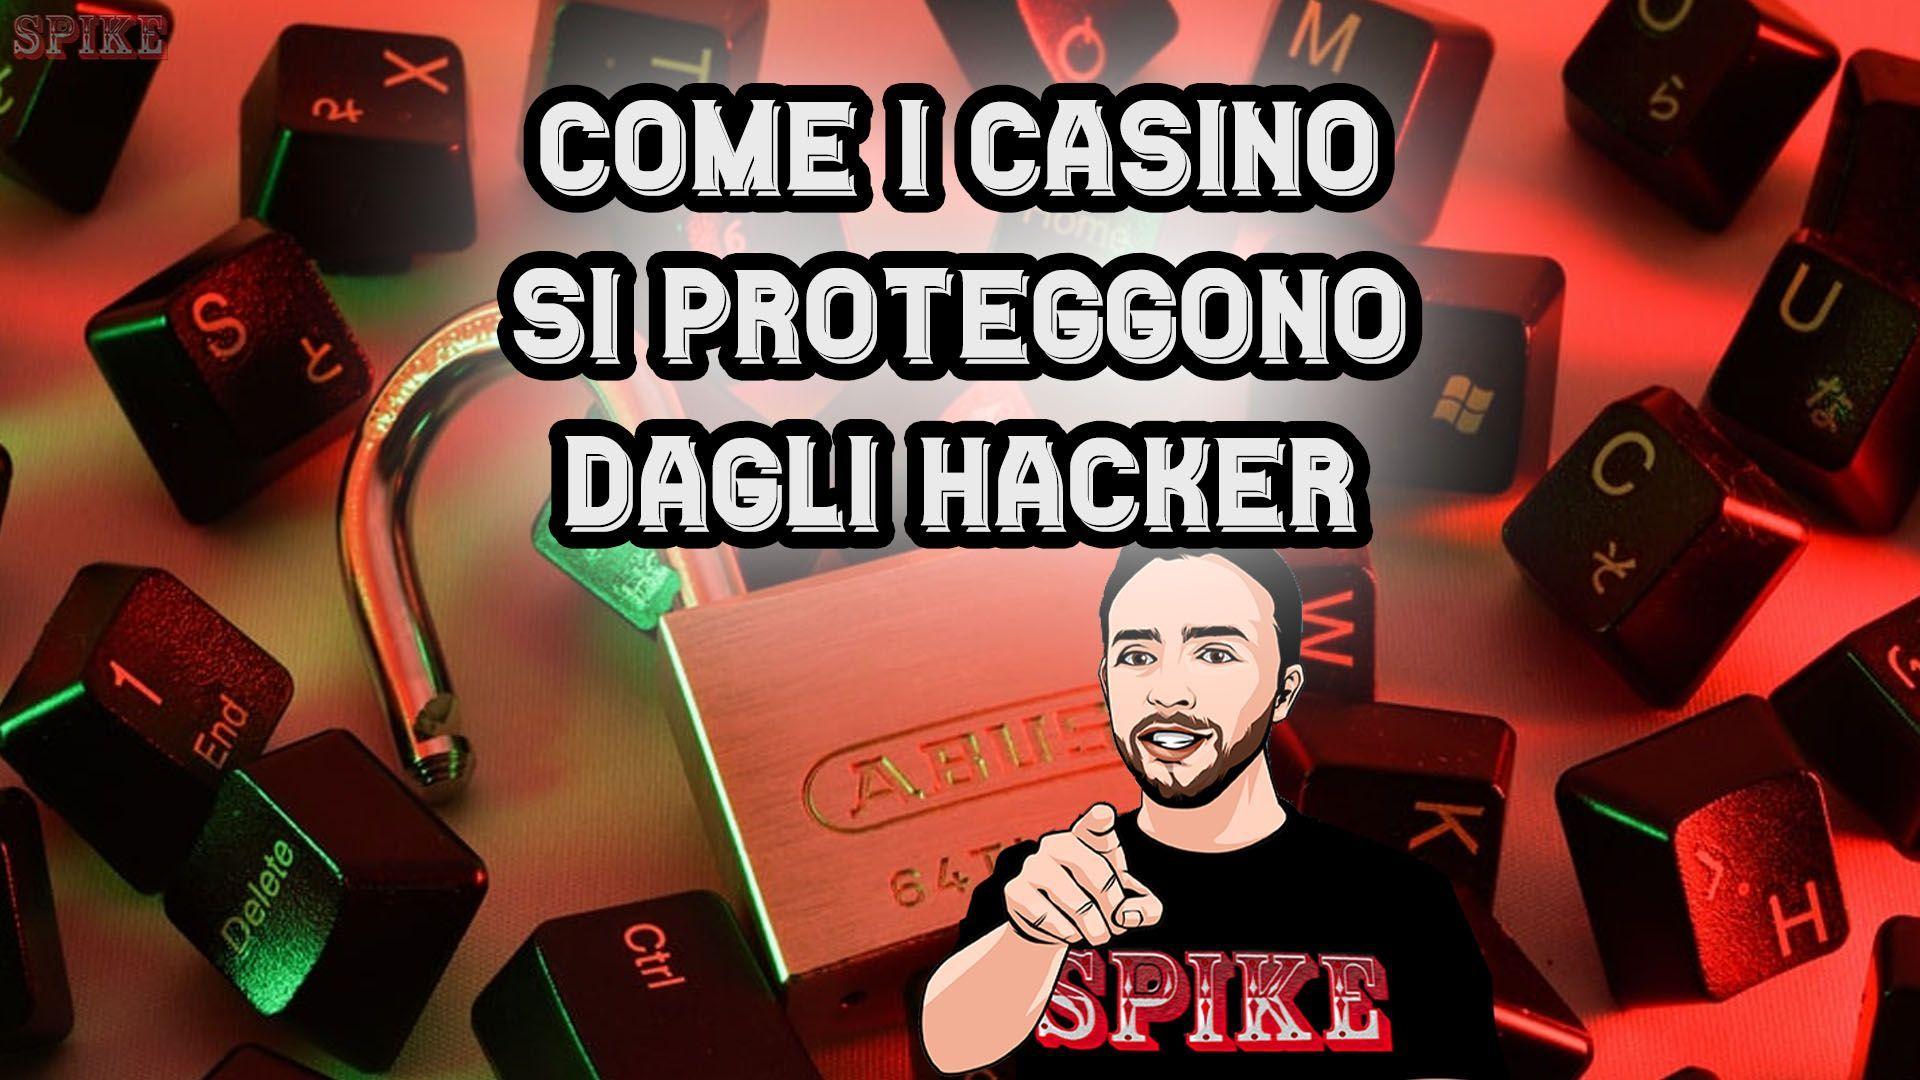 Casino Hacker